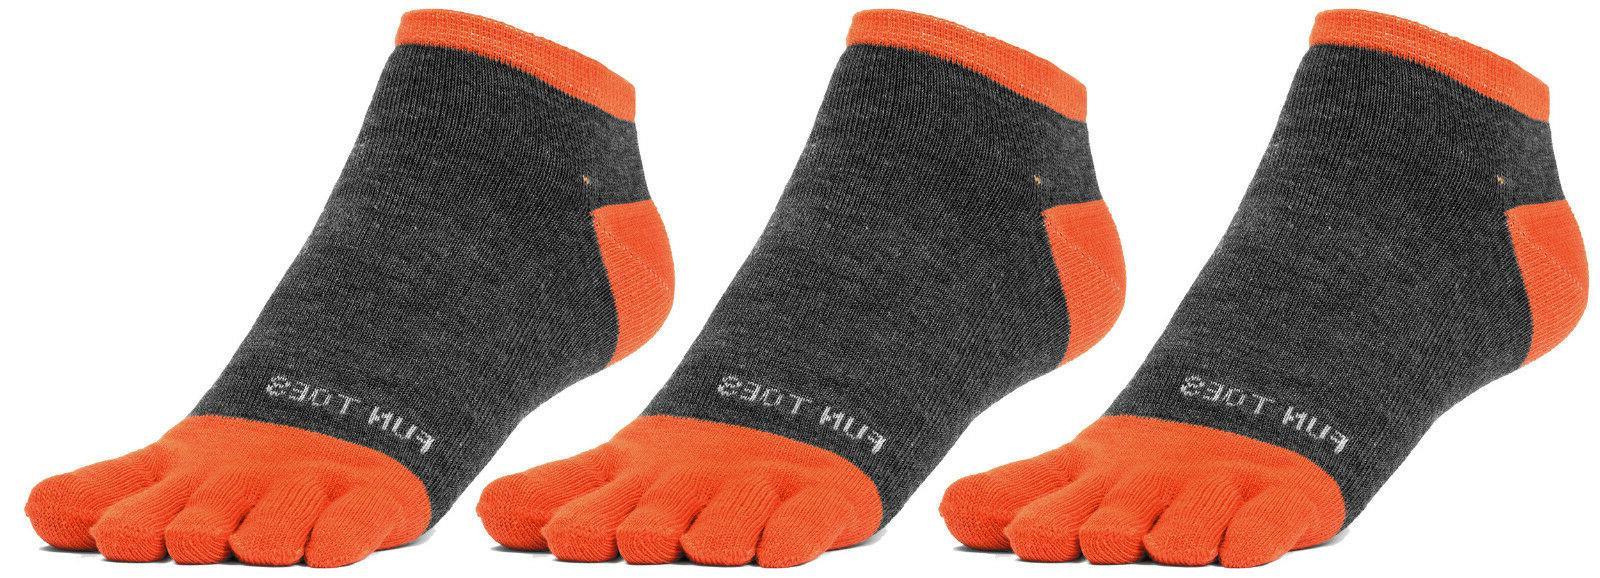 FUN TOES Men Toe Socks 3 Pairs High Performance Five Finger